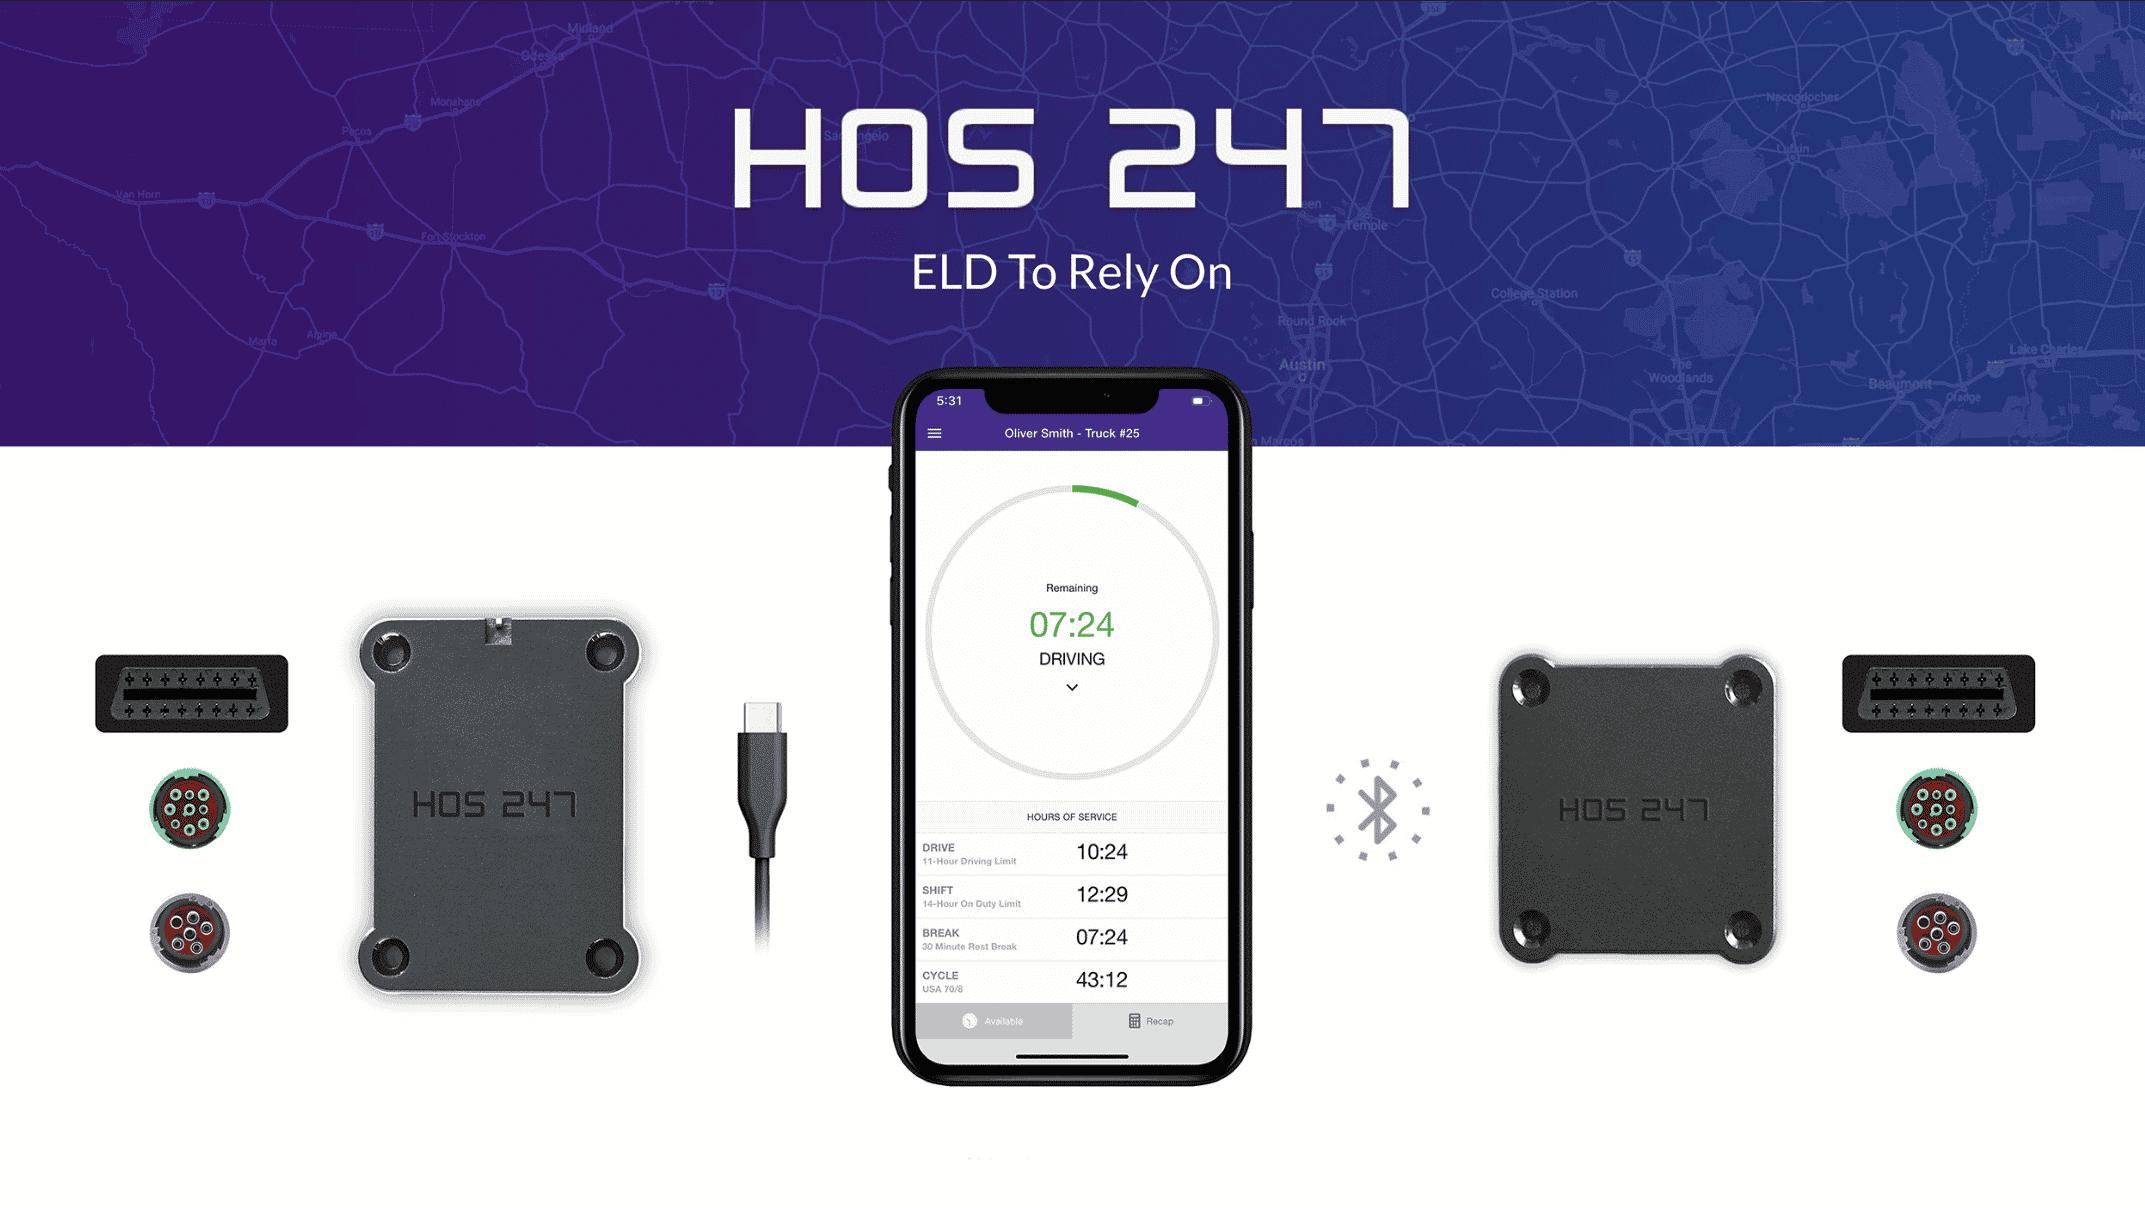 HOS247 ELD